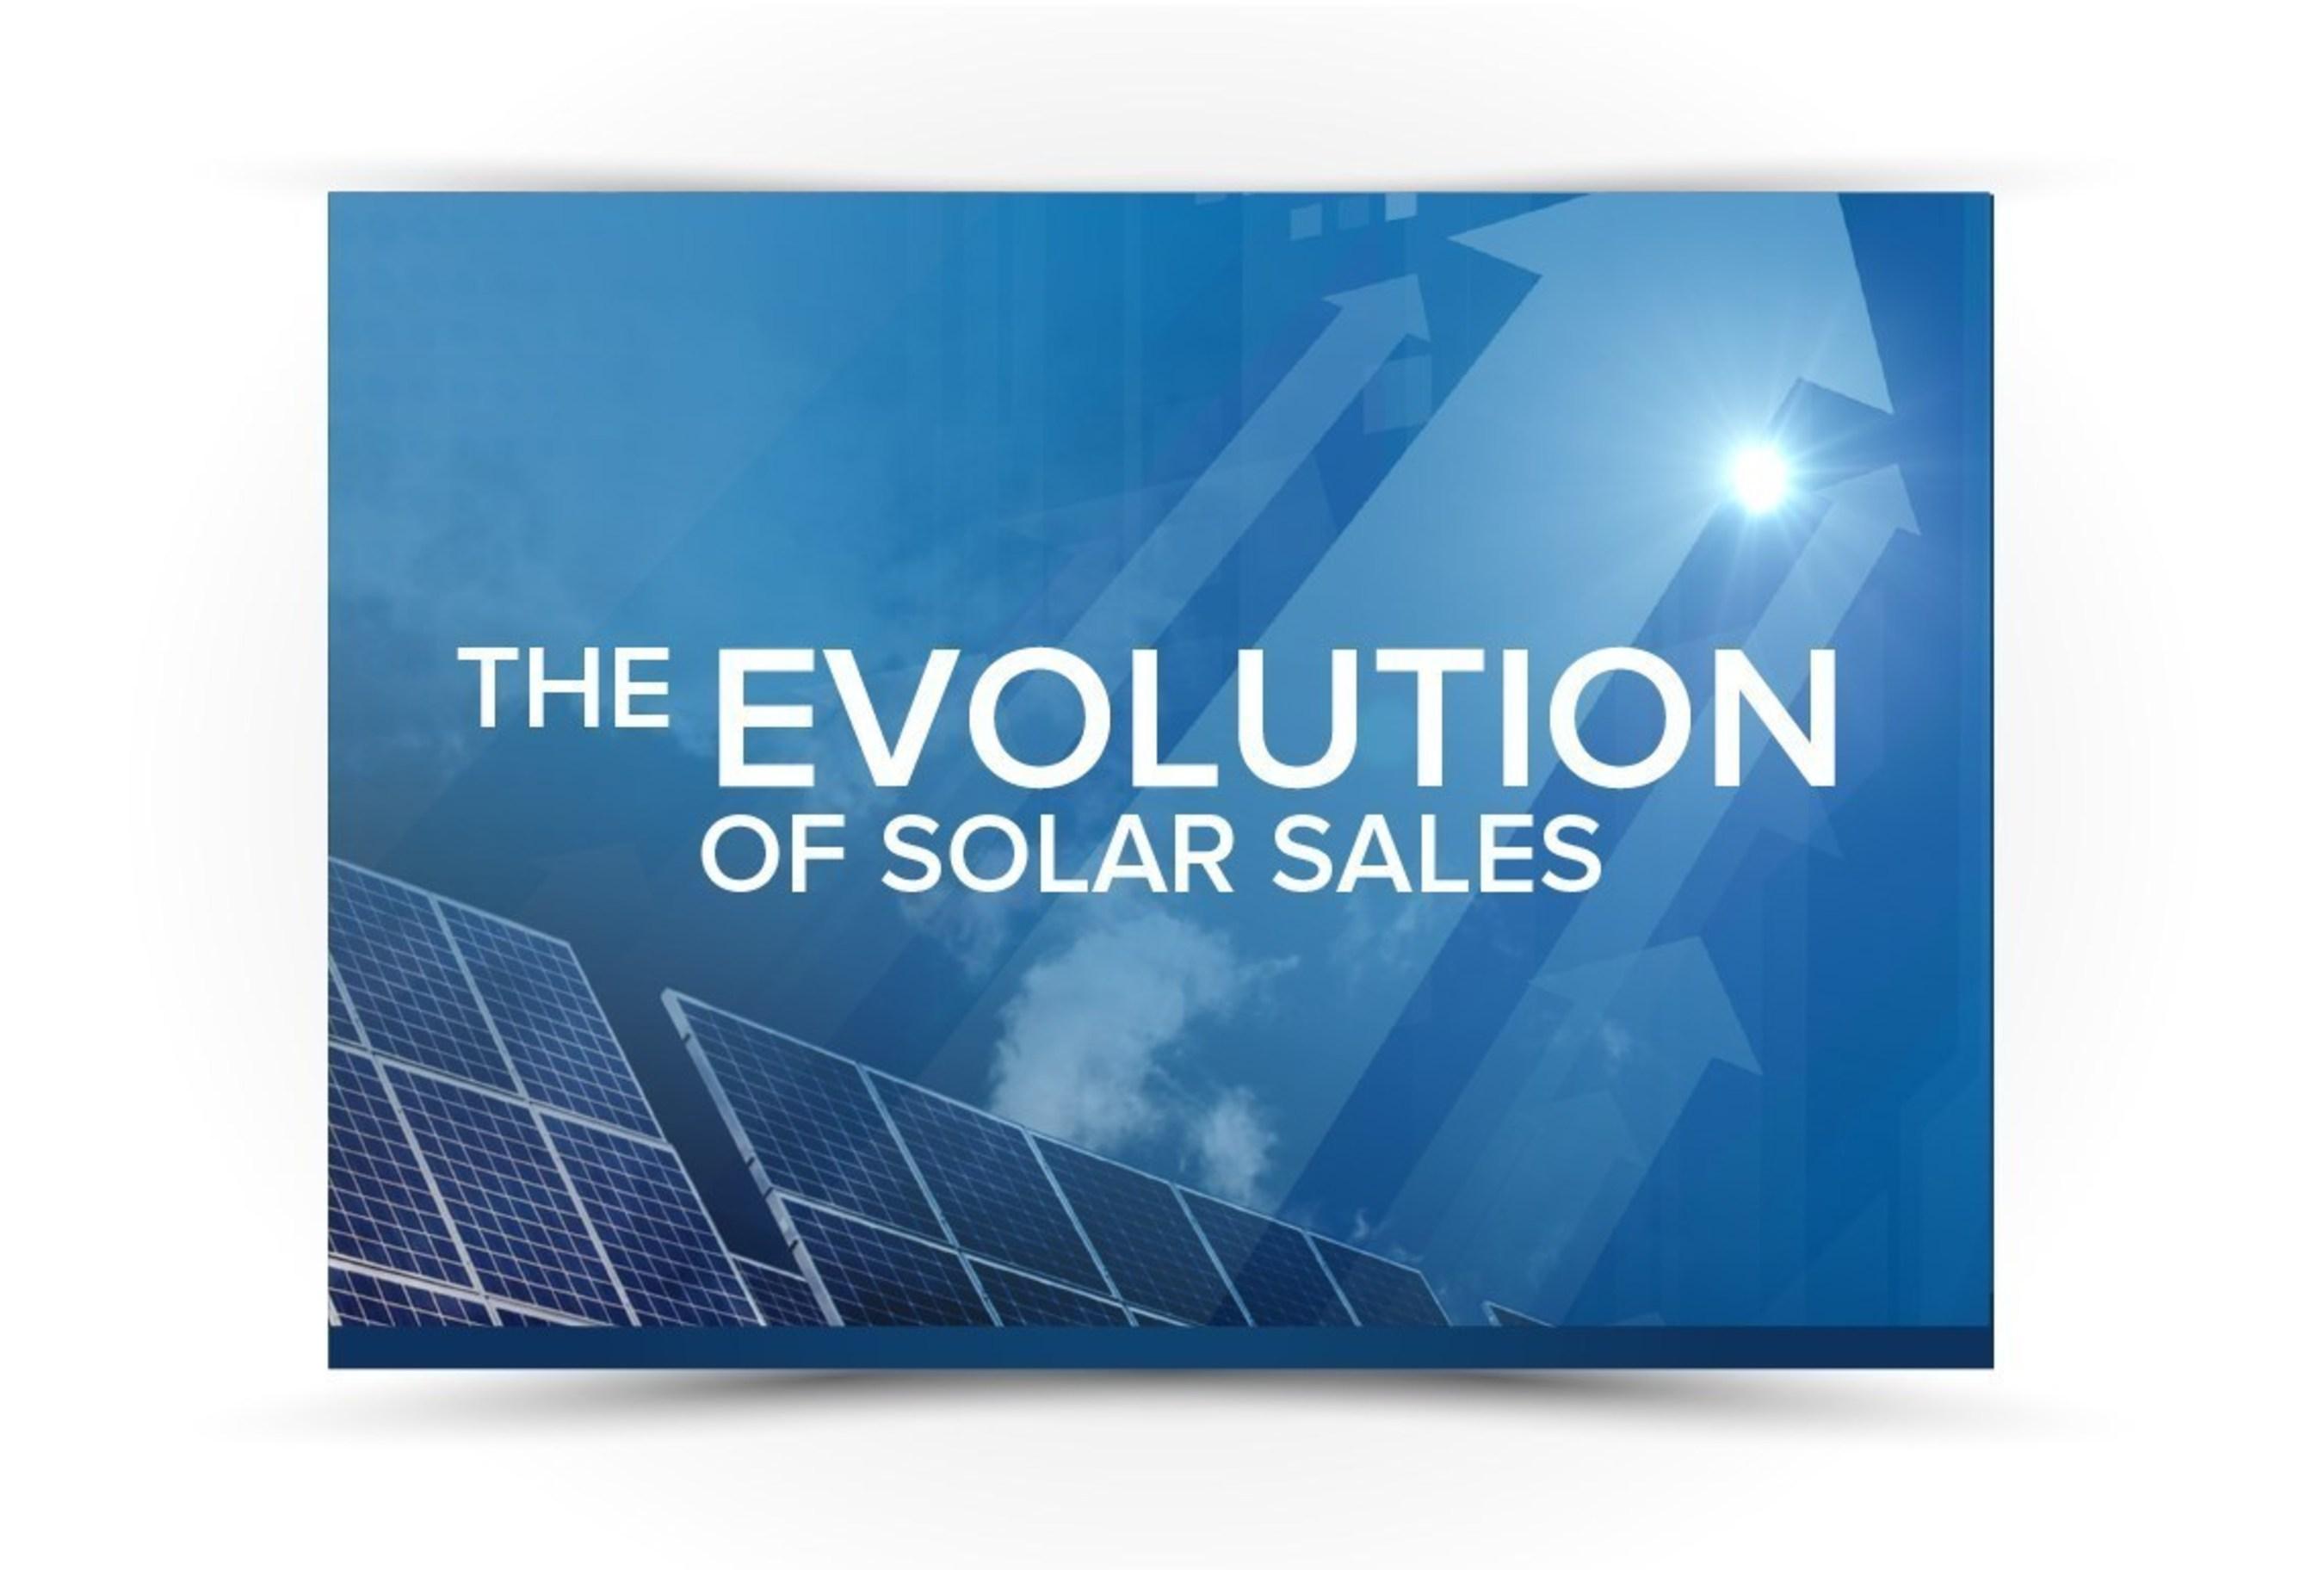 The Evolution of Solar Sales